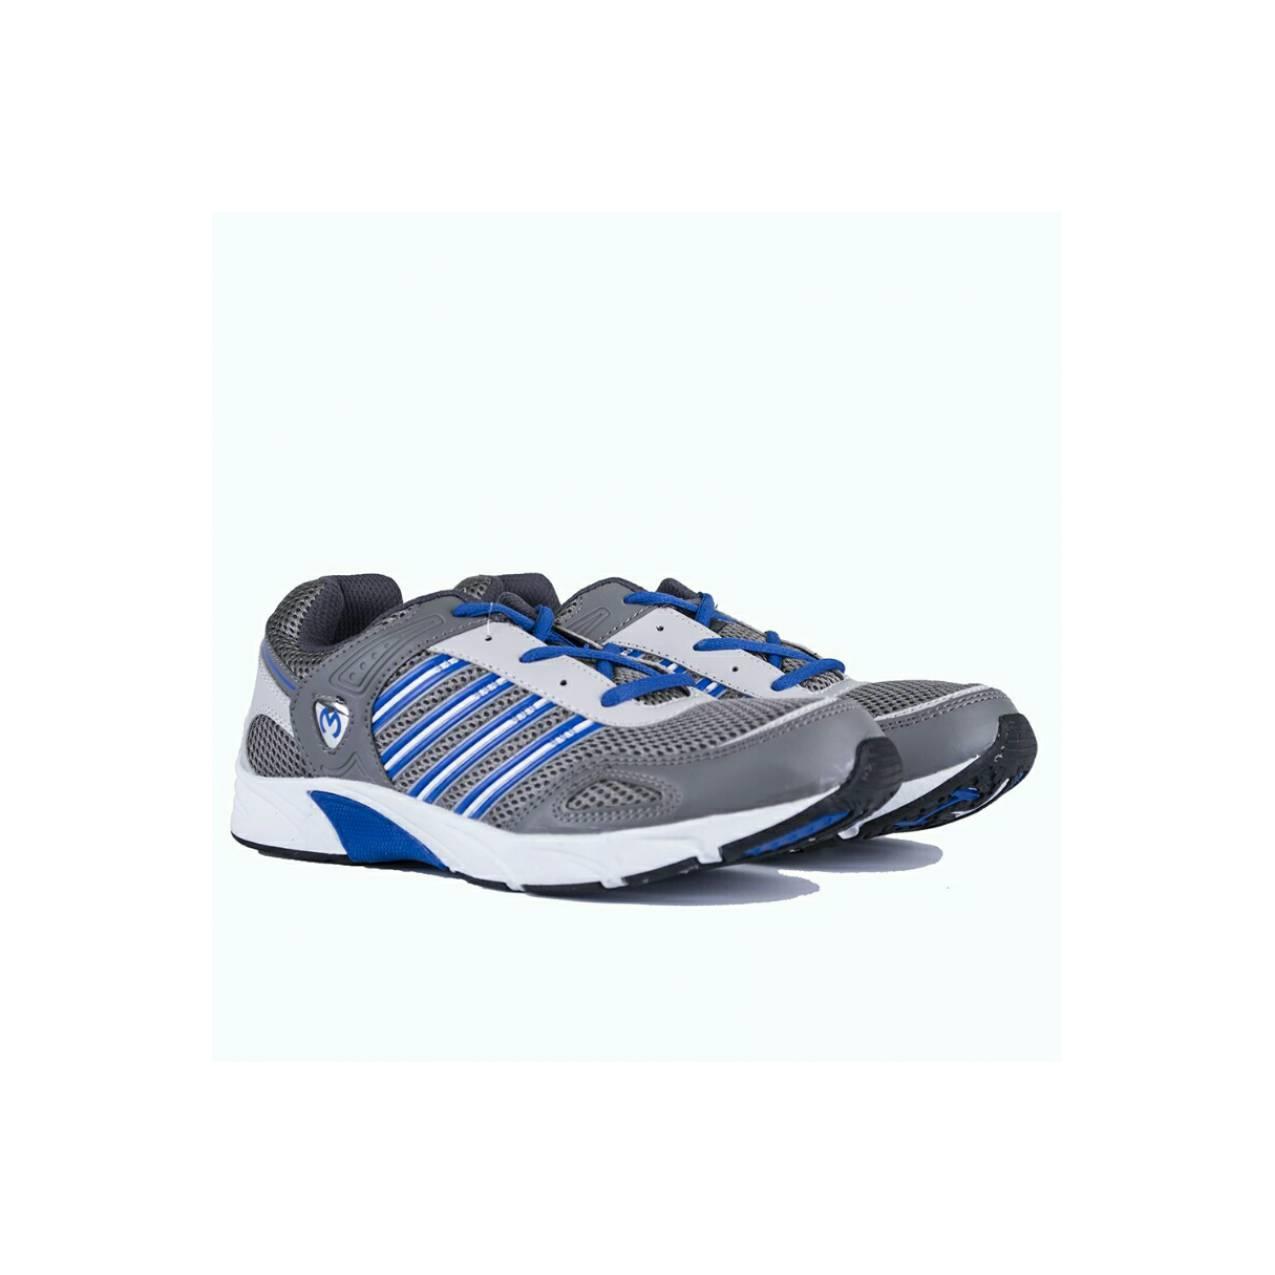 Sepatu Sport Mogul Pajero, sepatu sport, sepatu olahraga, pc